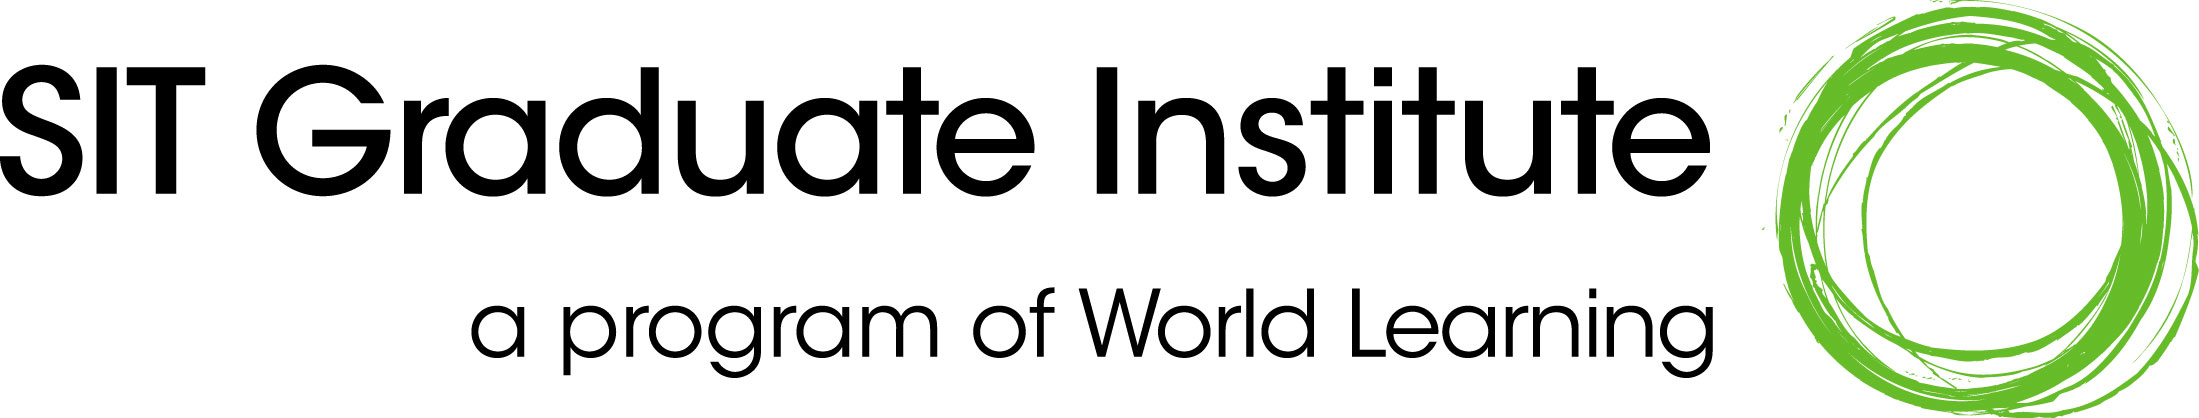 sit-graduate-institute-logo.jpg